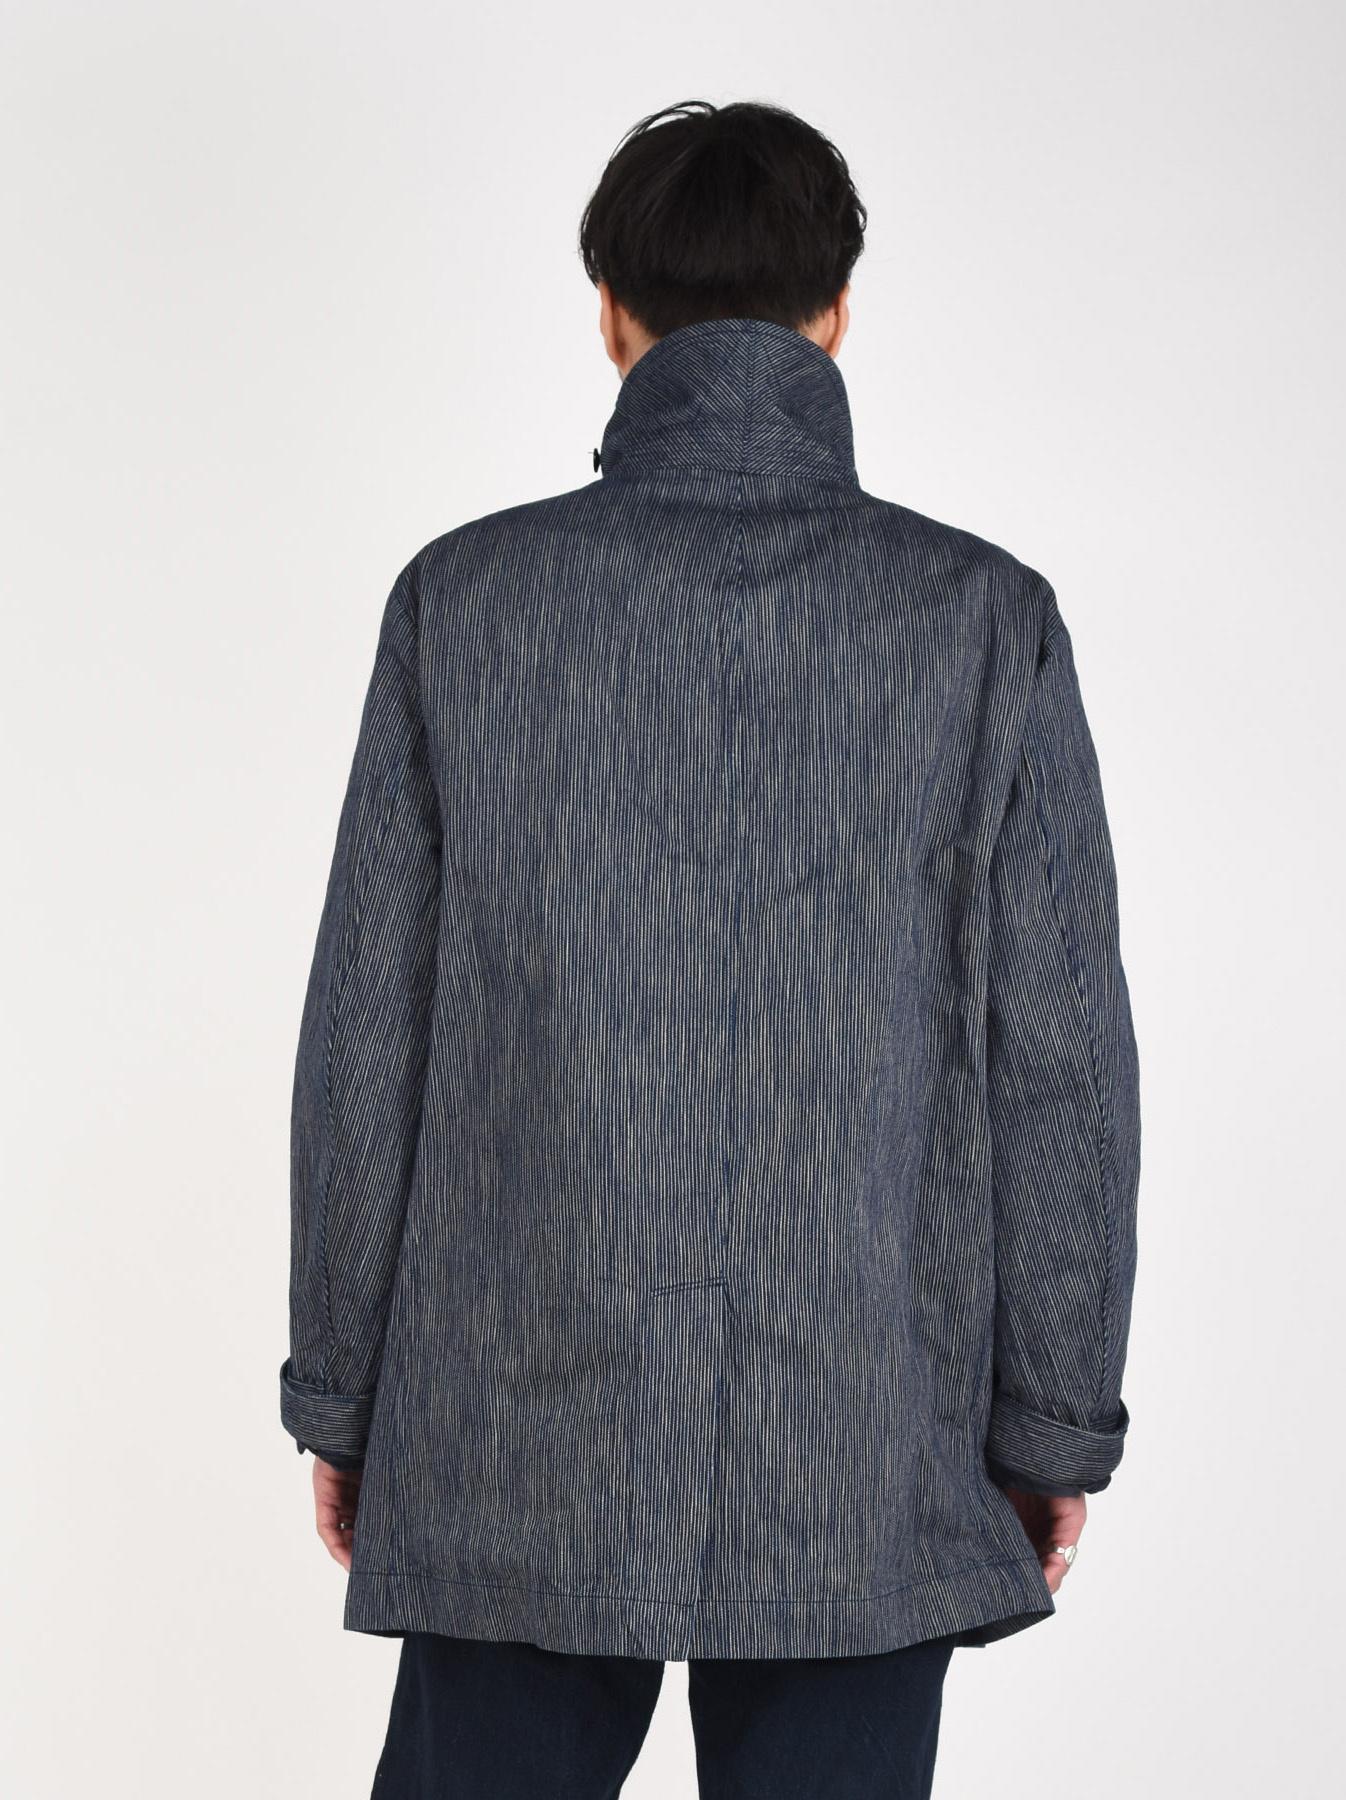 WH Indigo Mugi Yoko-shusi P-coat-6